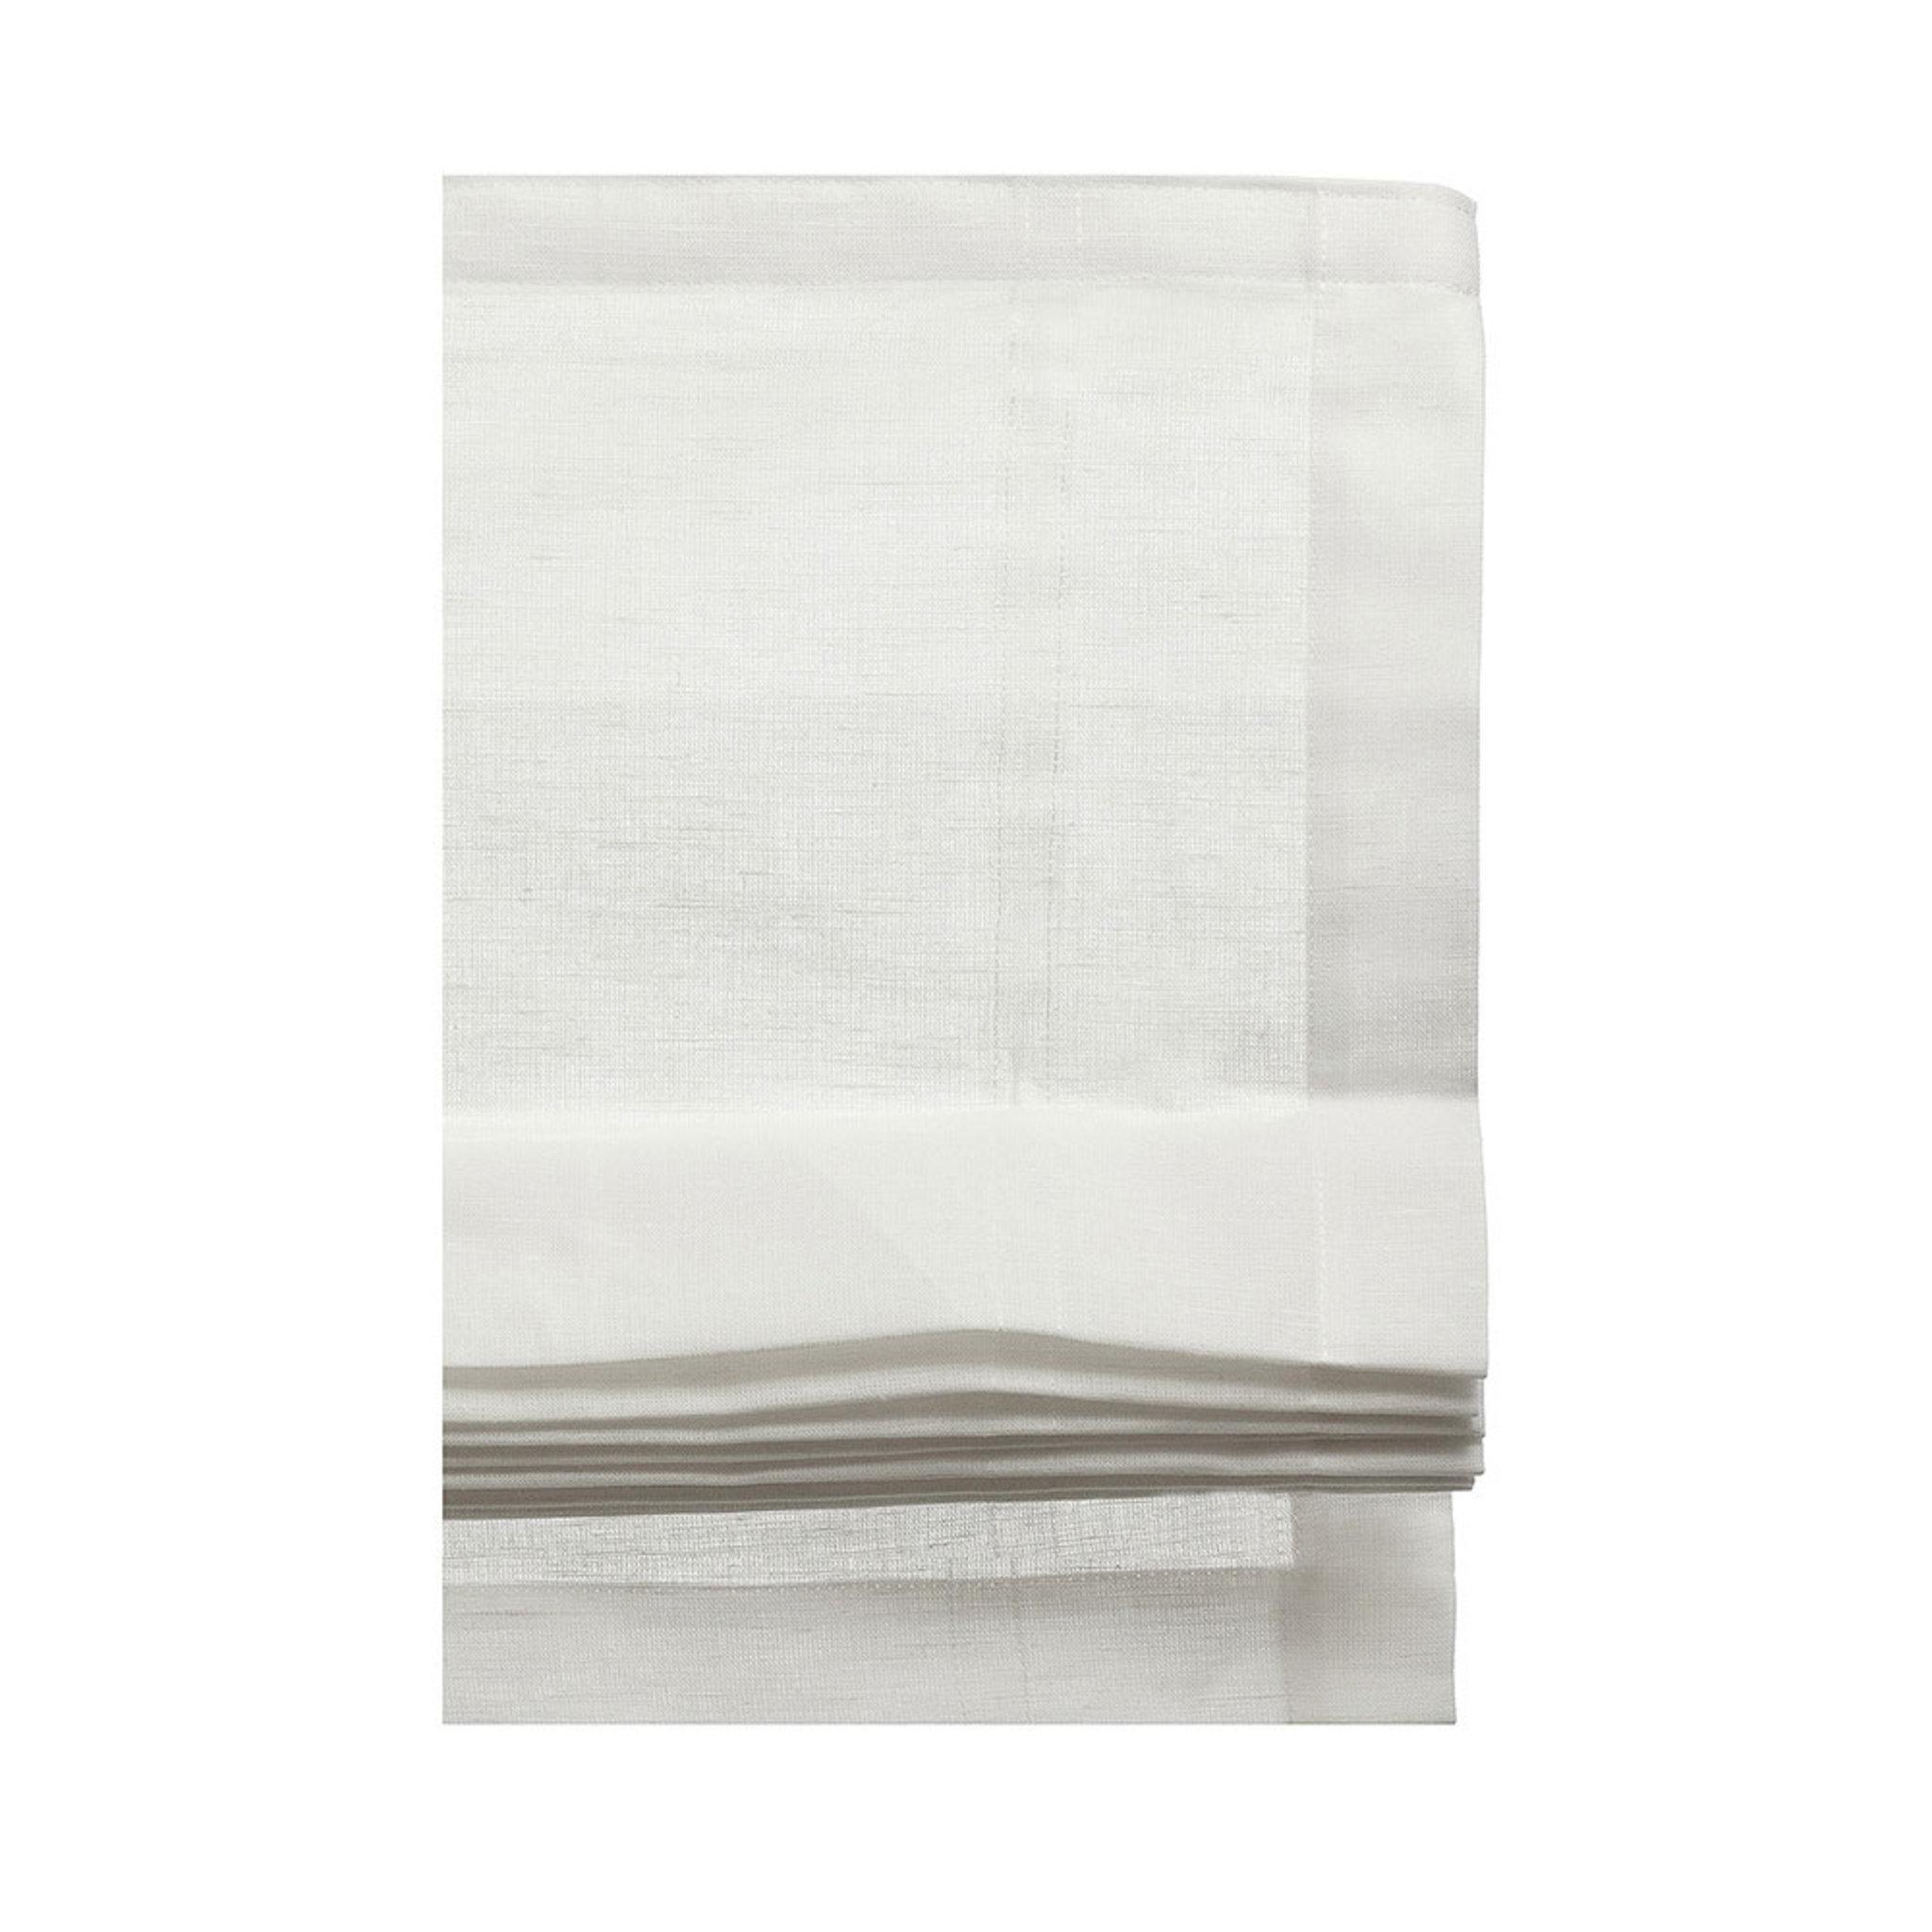 Hissgardin Ebba 150×180 cm